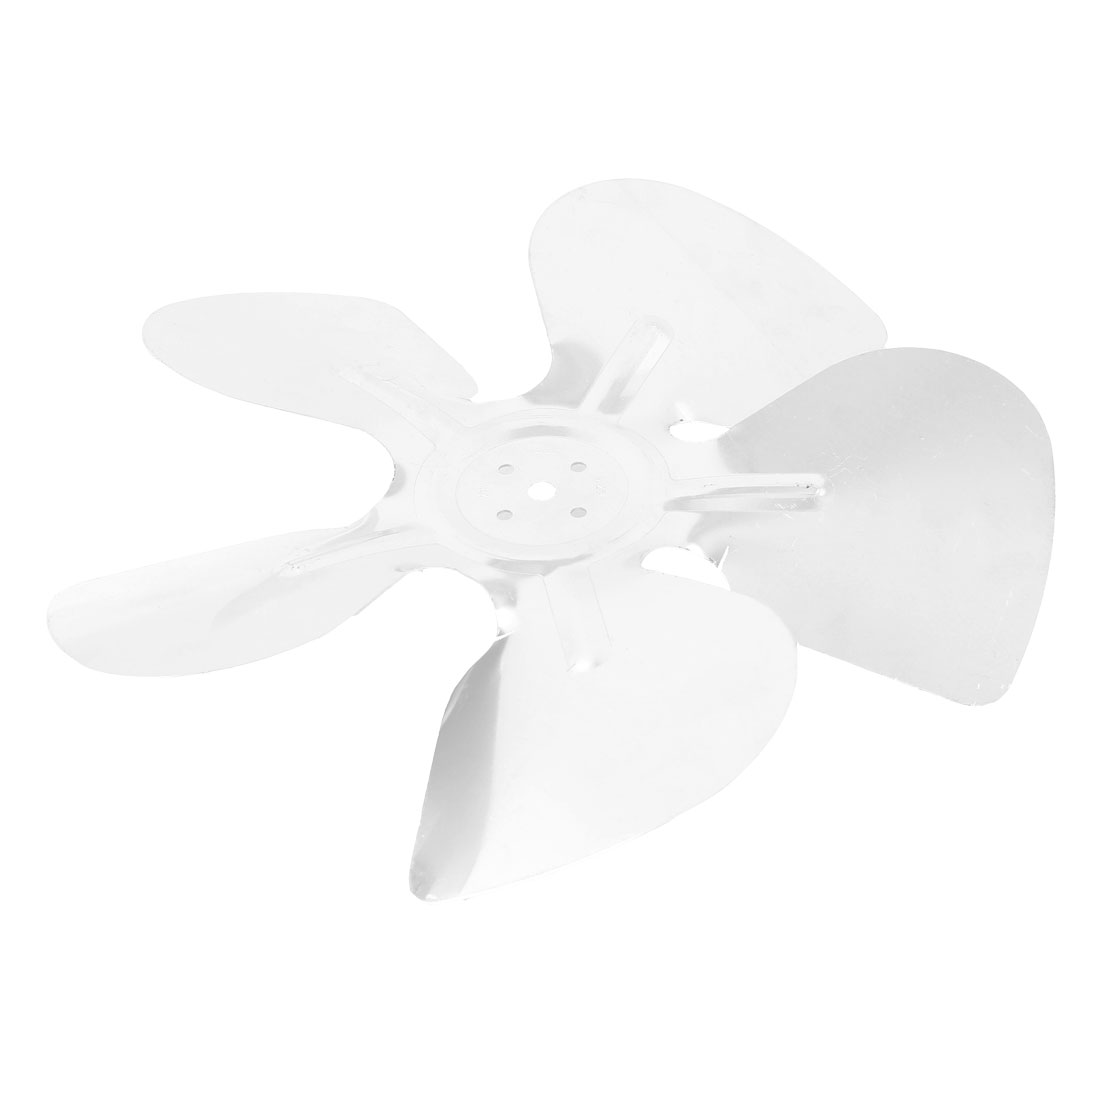 Home Plant Restaurant Kitchen Silver Tone Aluminum Alloy Refrigertor Ventilator Exaust Motor Fan Vanes